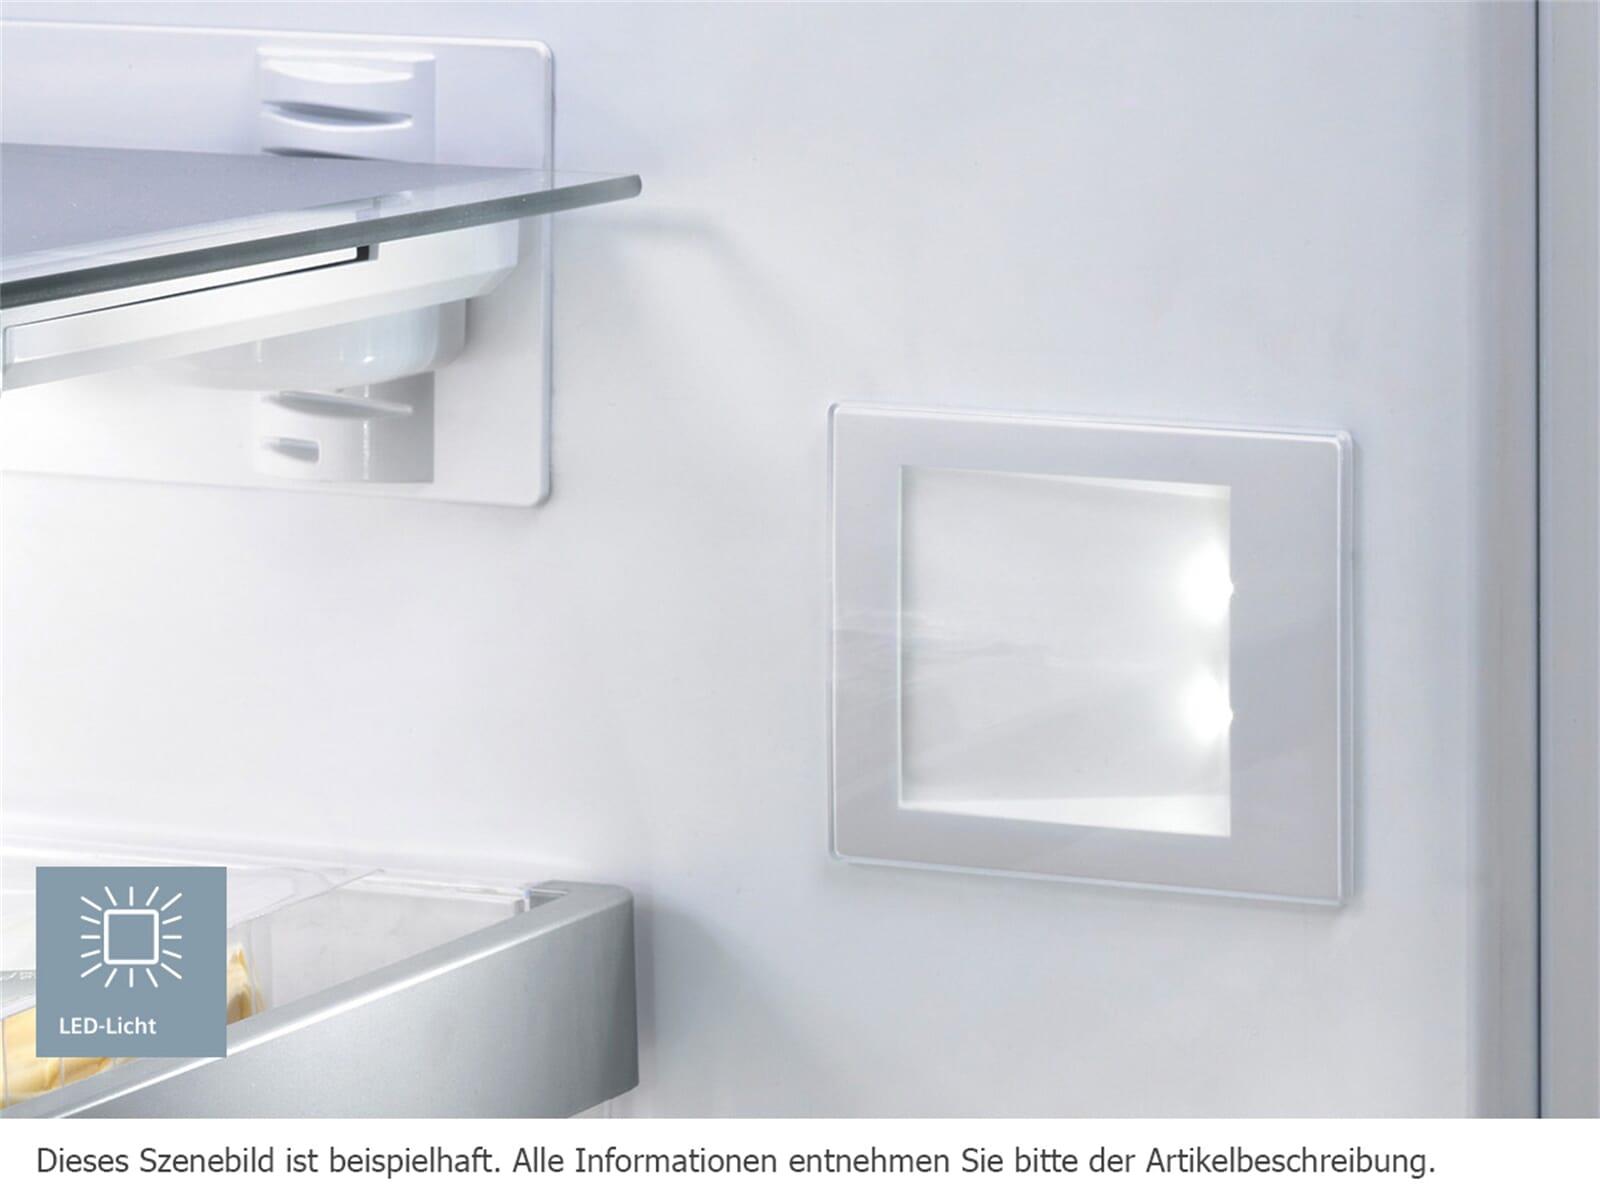 siemens ka99naw35 side by side k hl gefrier kombination wei ks36vaw41 gs36naw31. Black Bedroom Furniture Sets. Home Design Ideas